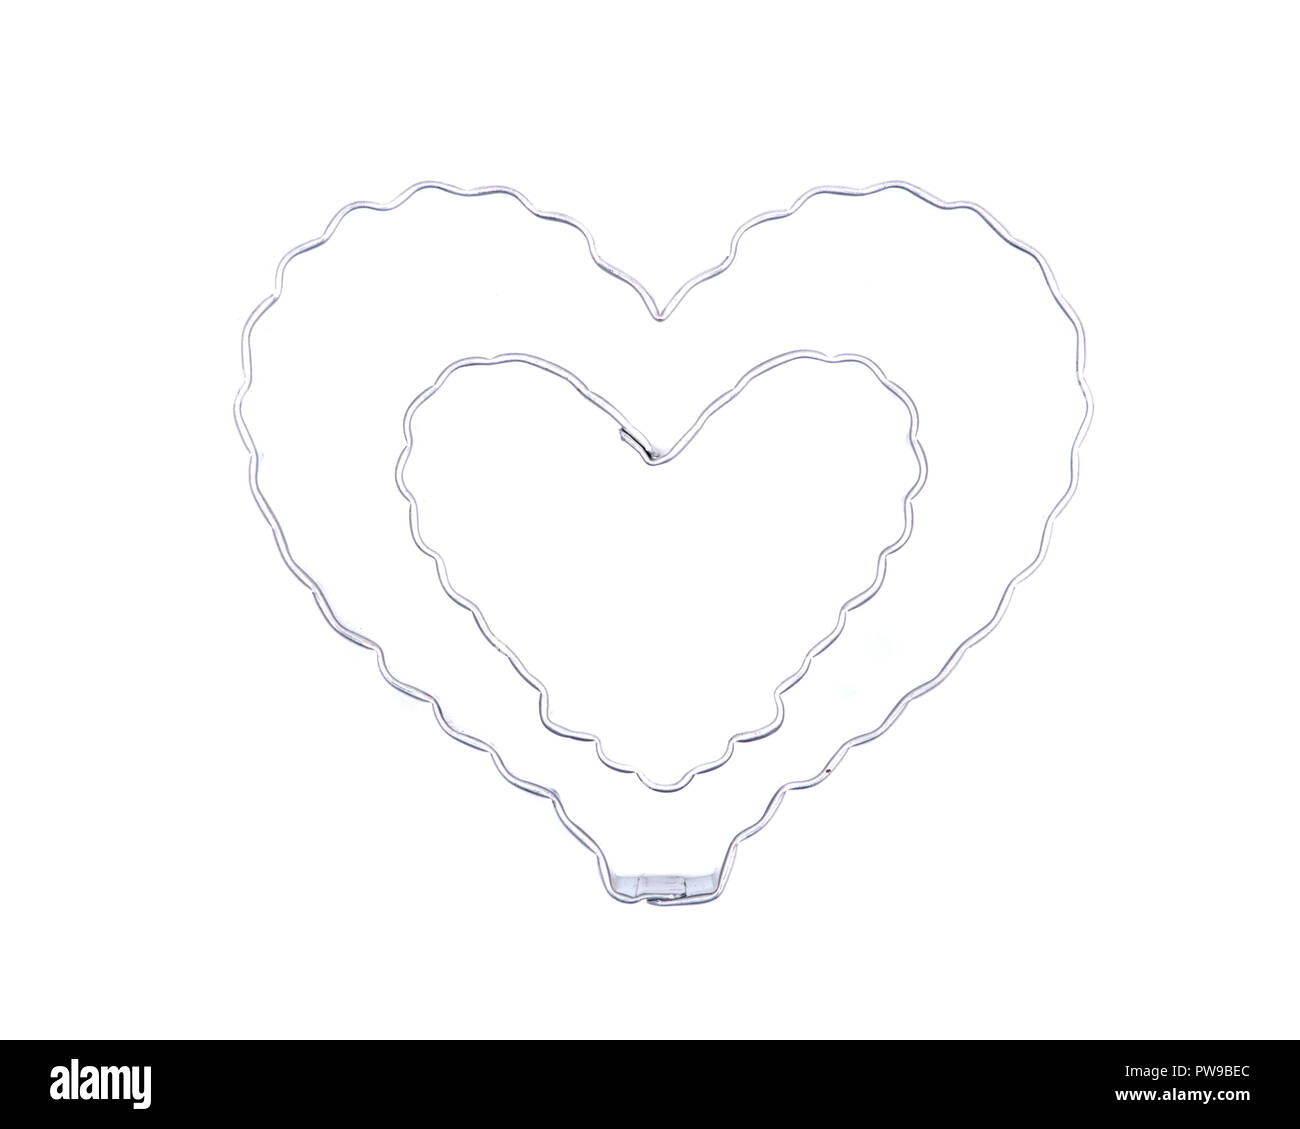 Edelstahl Herzformiges Geschenk Kekse Form Schneiden Schimmel